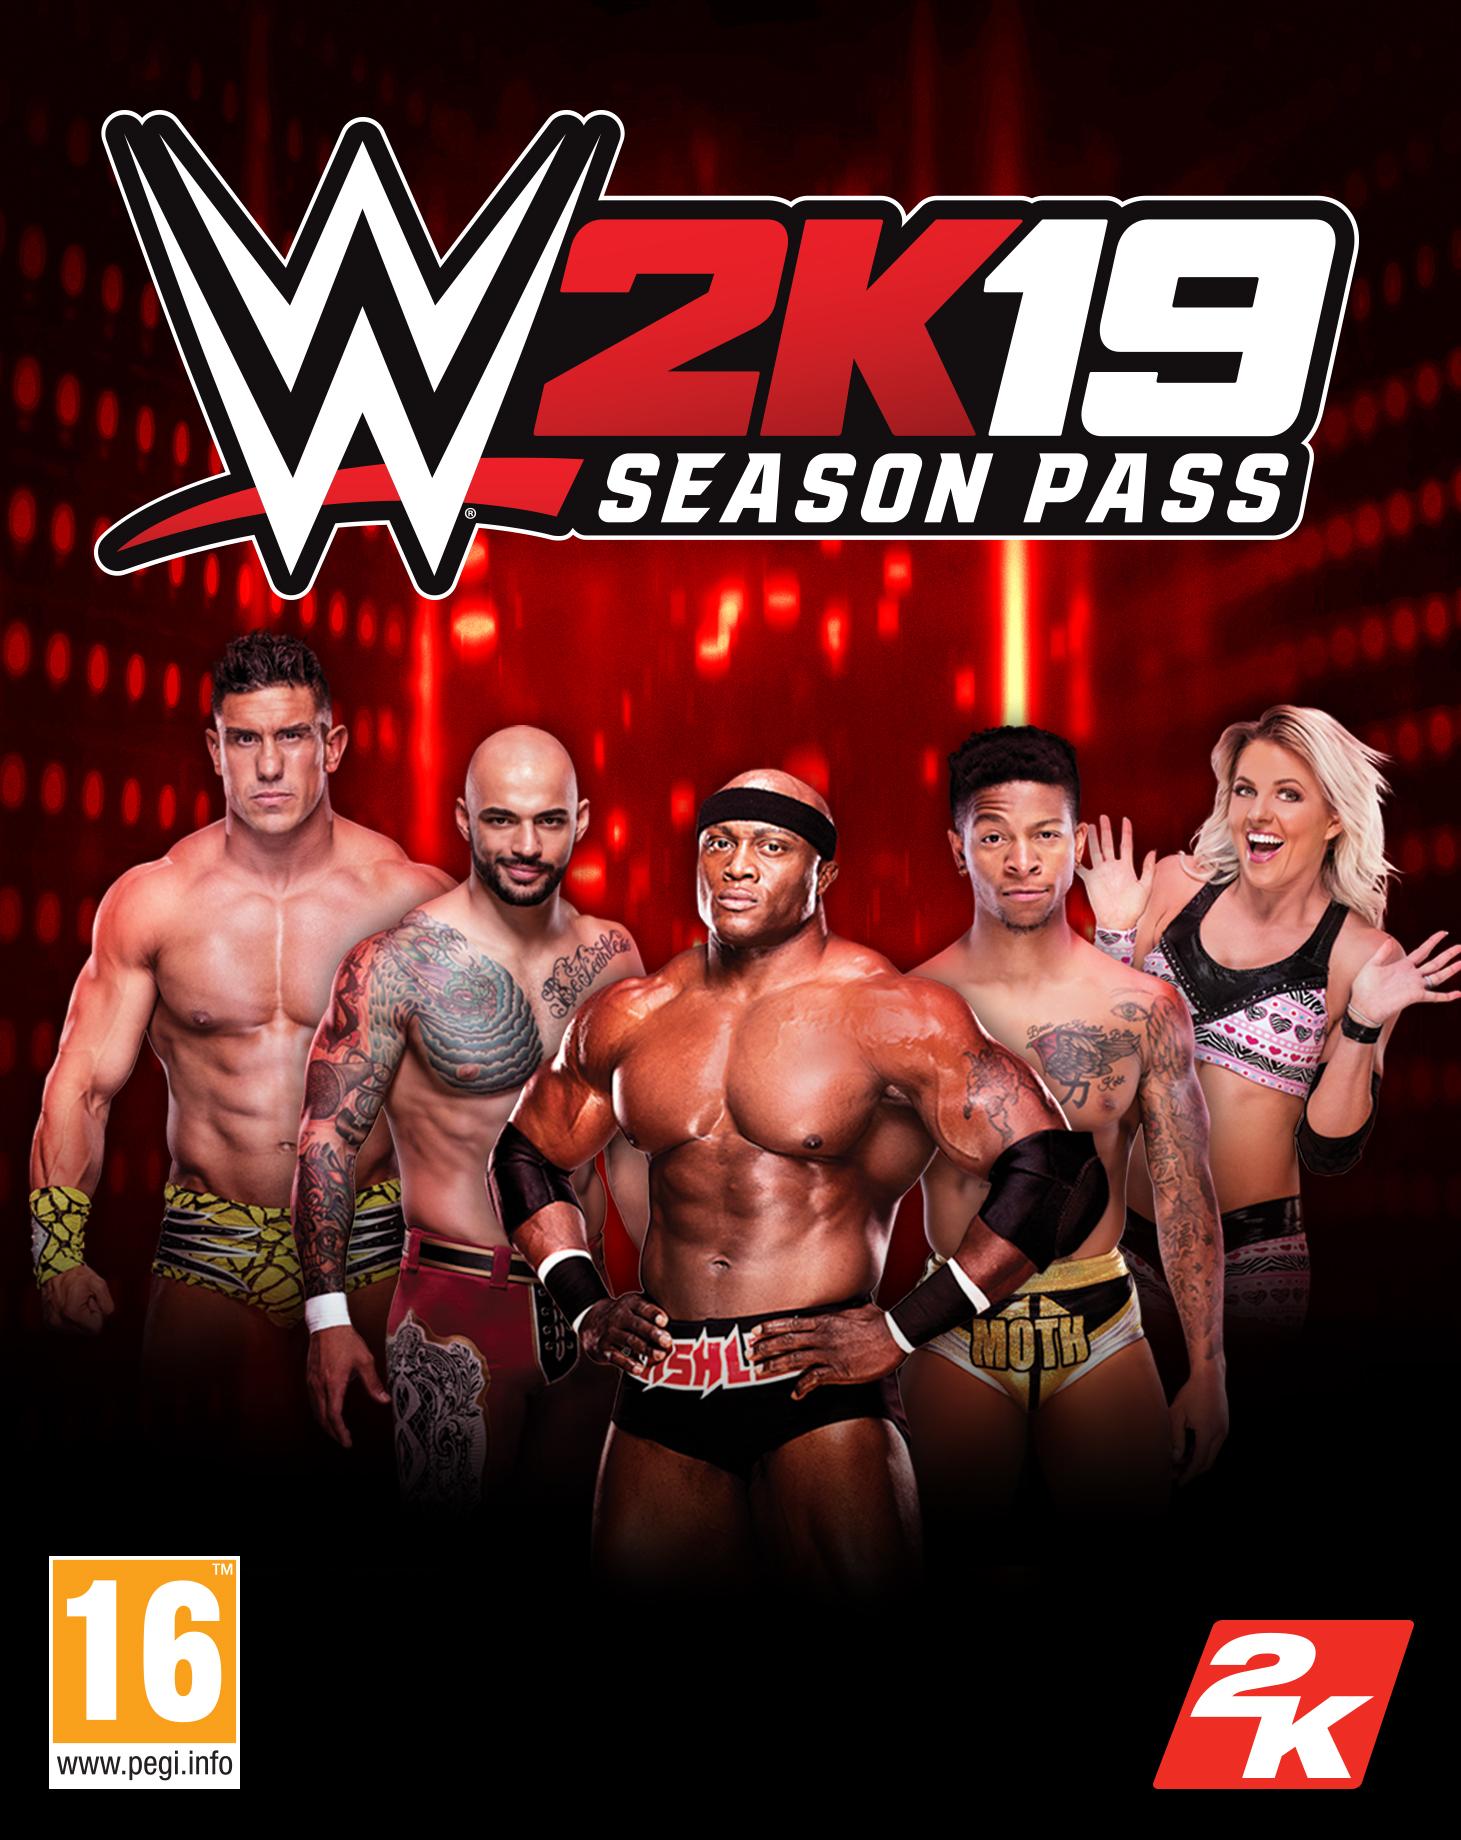 WWE 2K19 Season Pass DLC